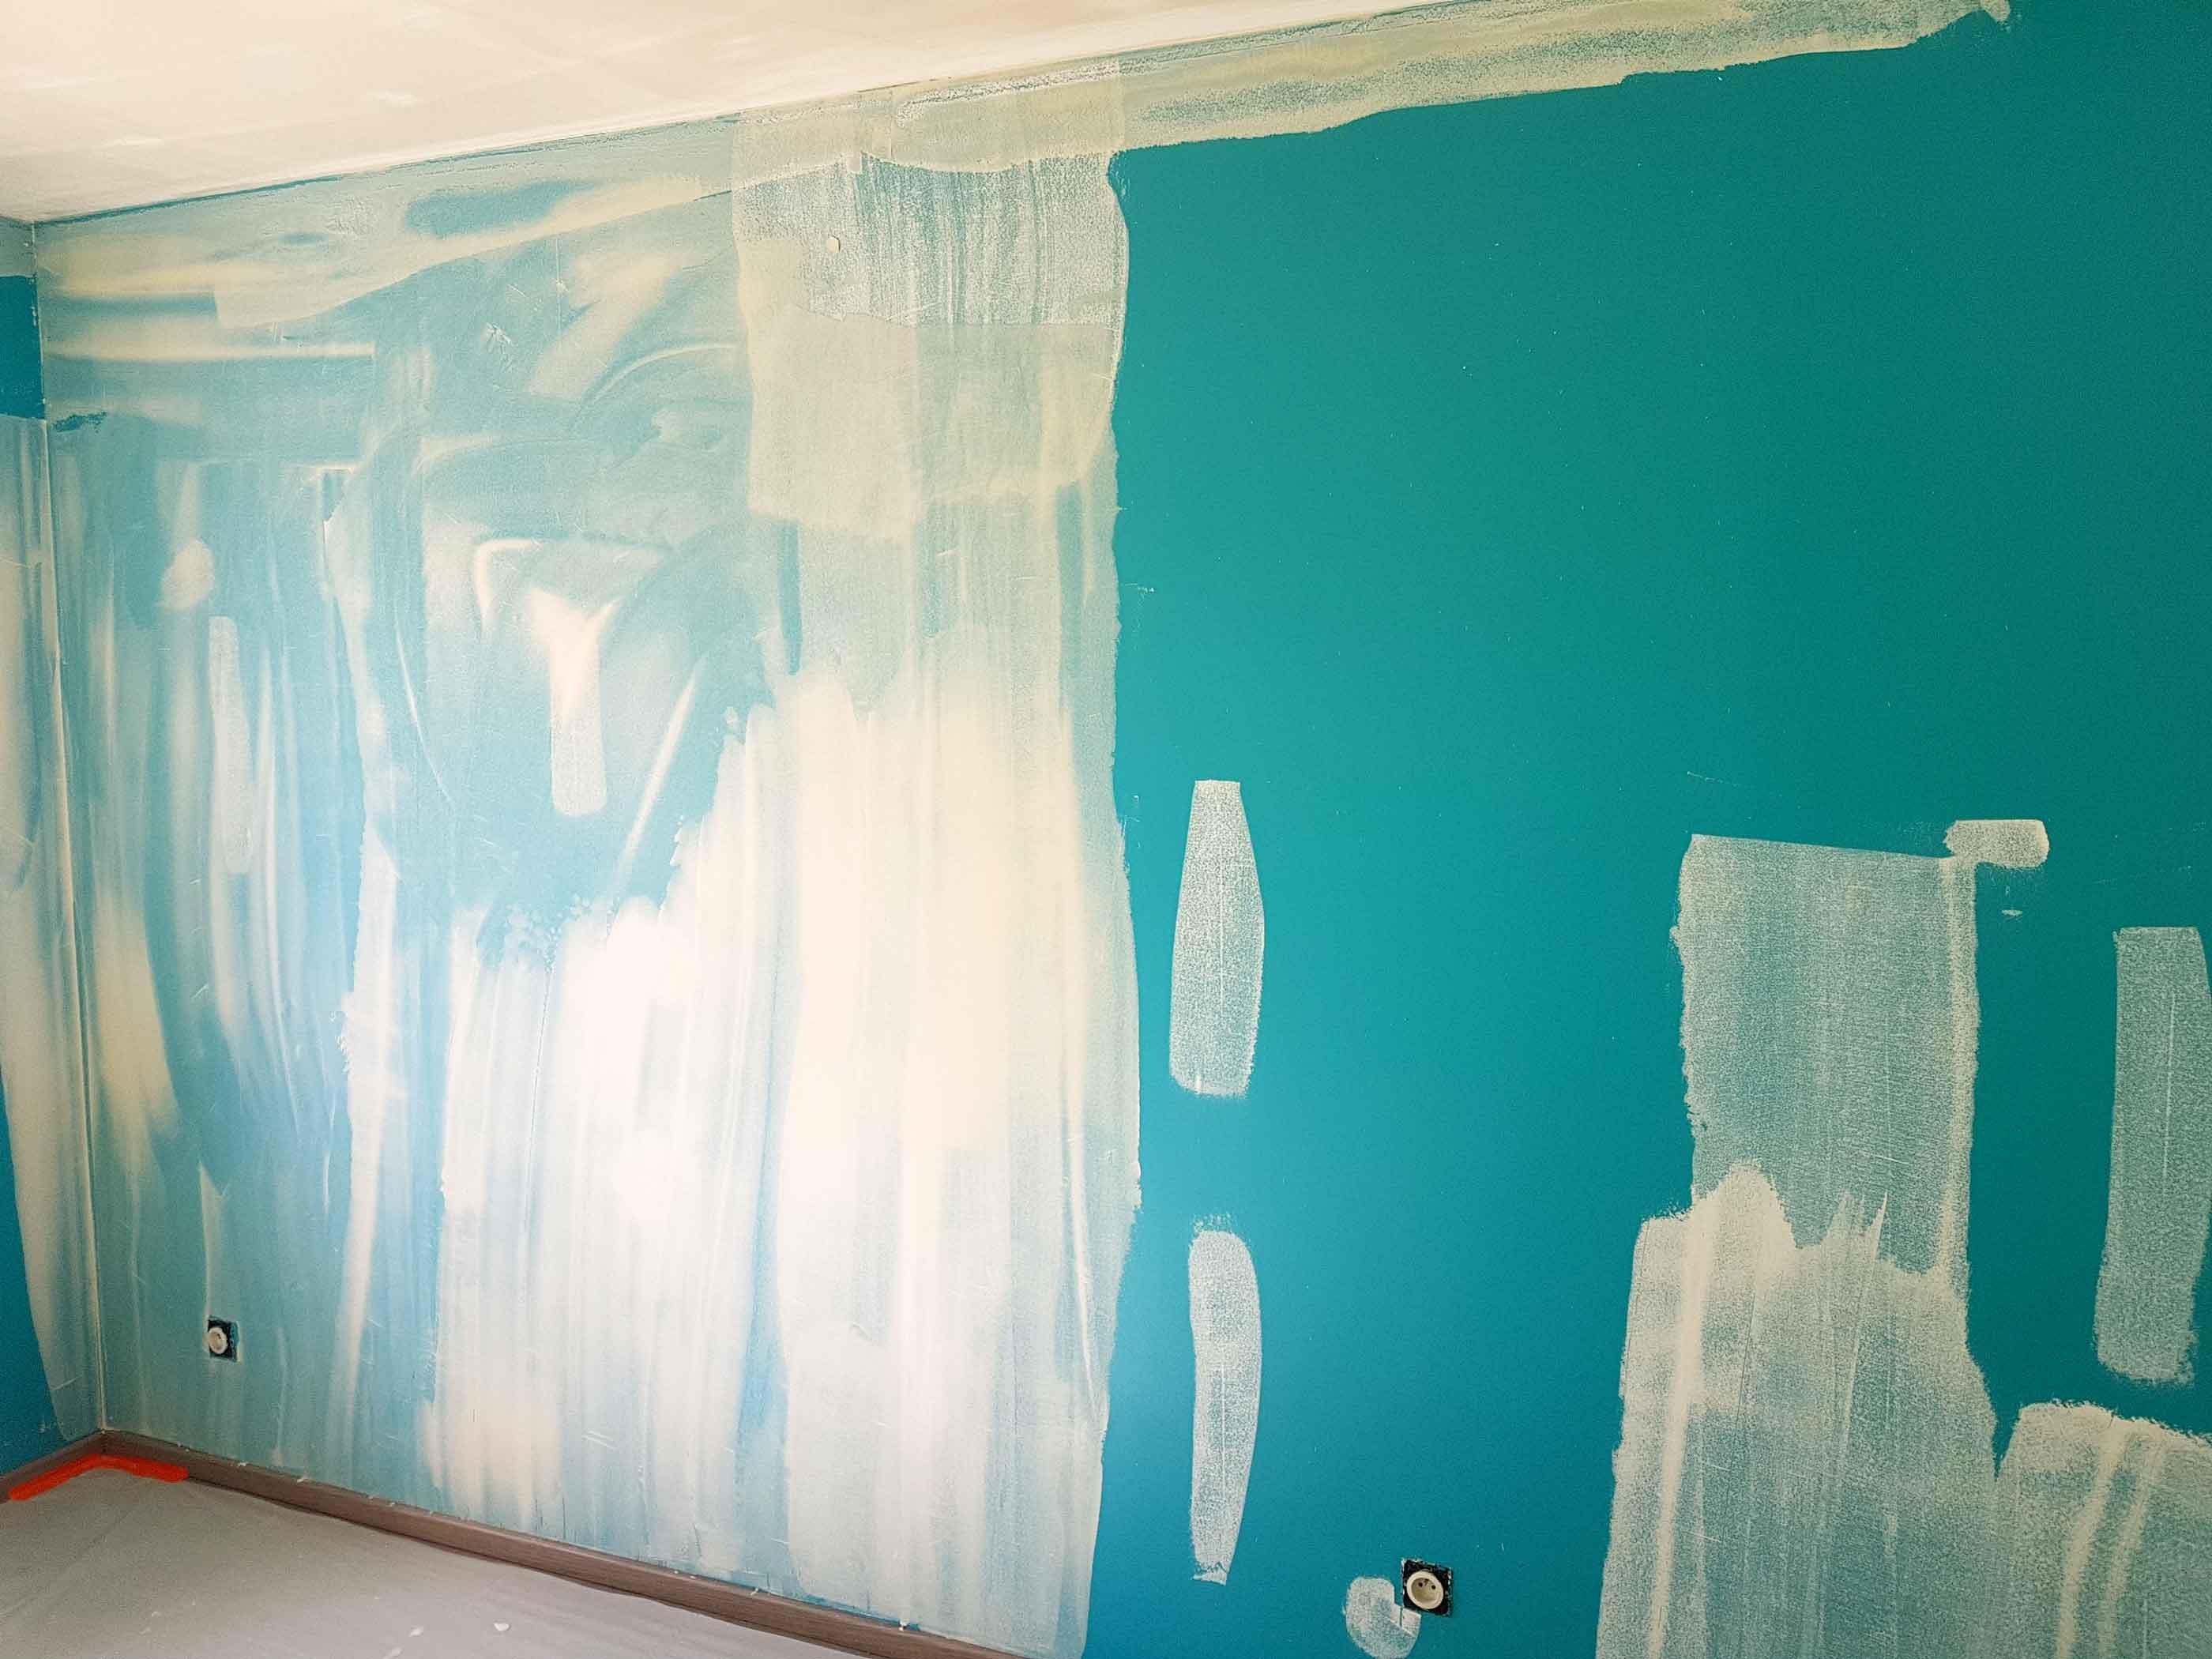 travaux-renovation peinture ratissage murs